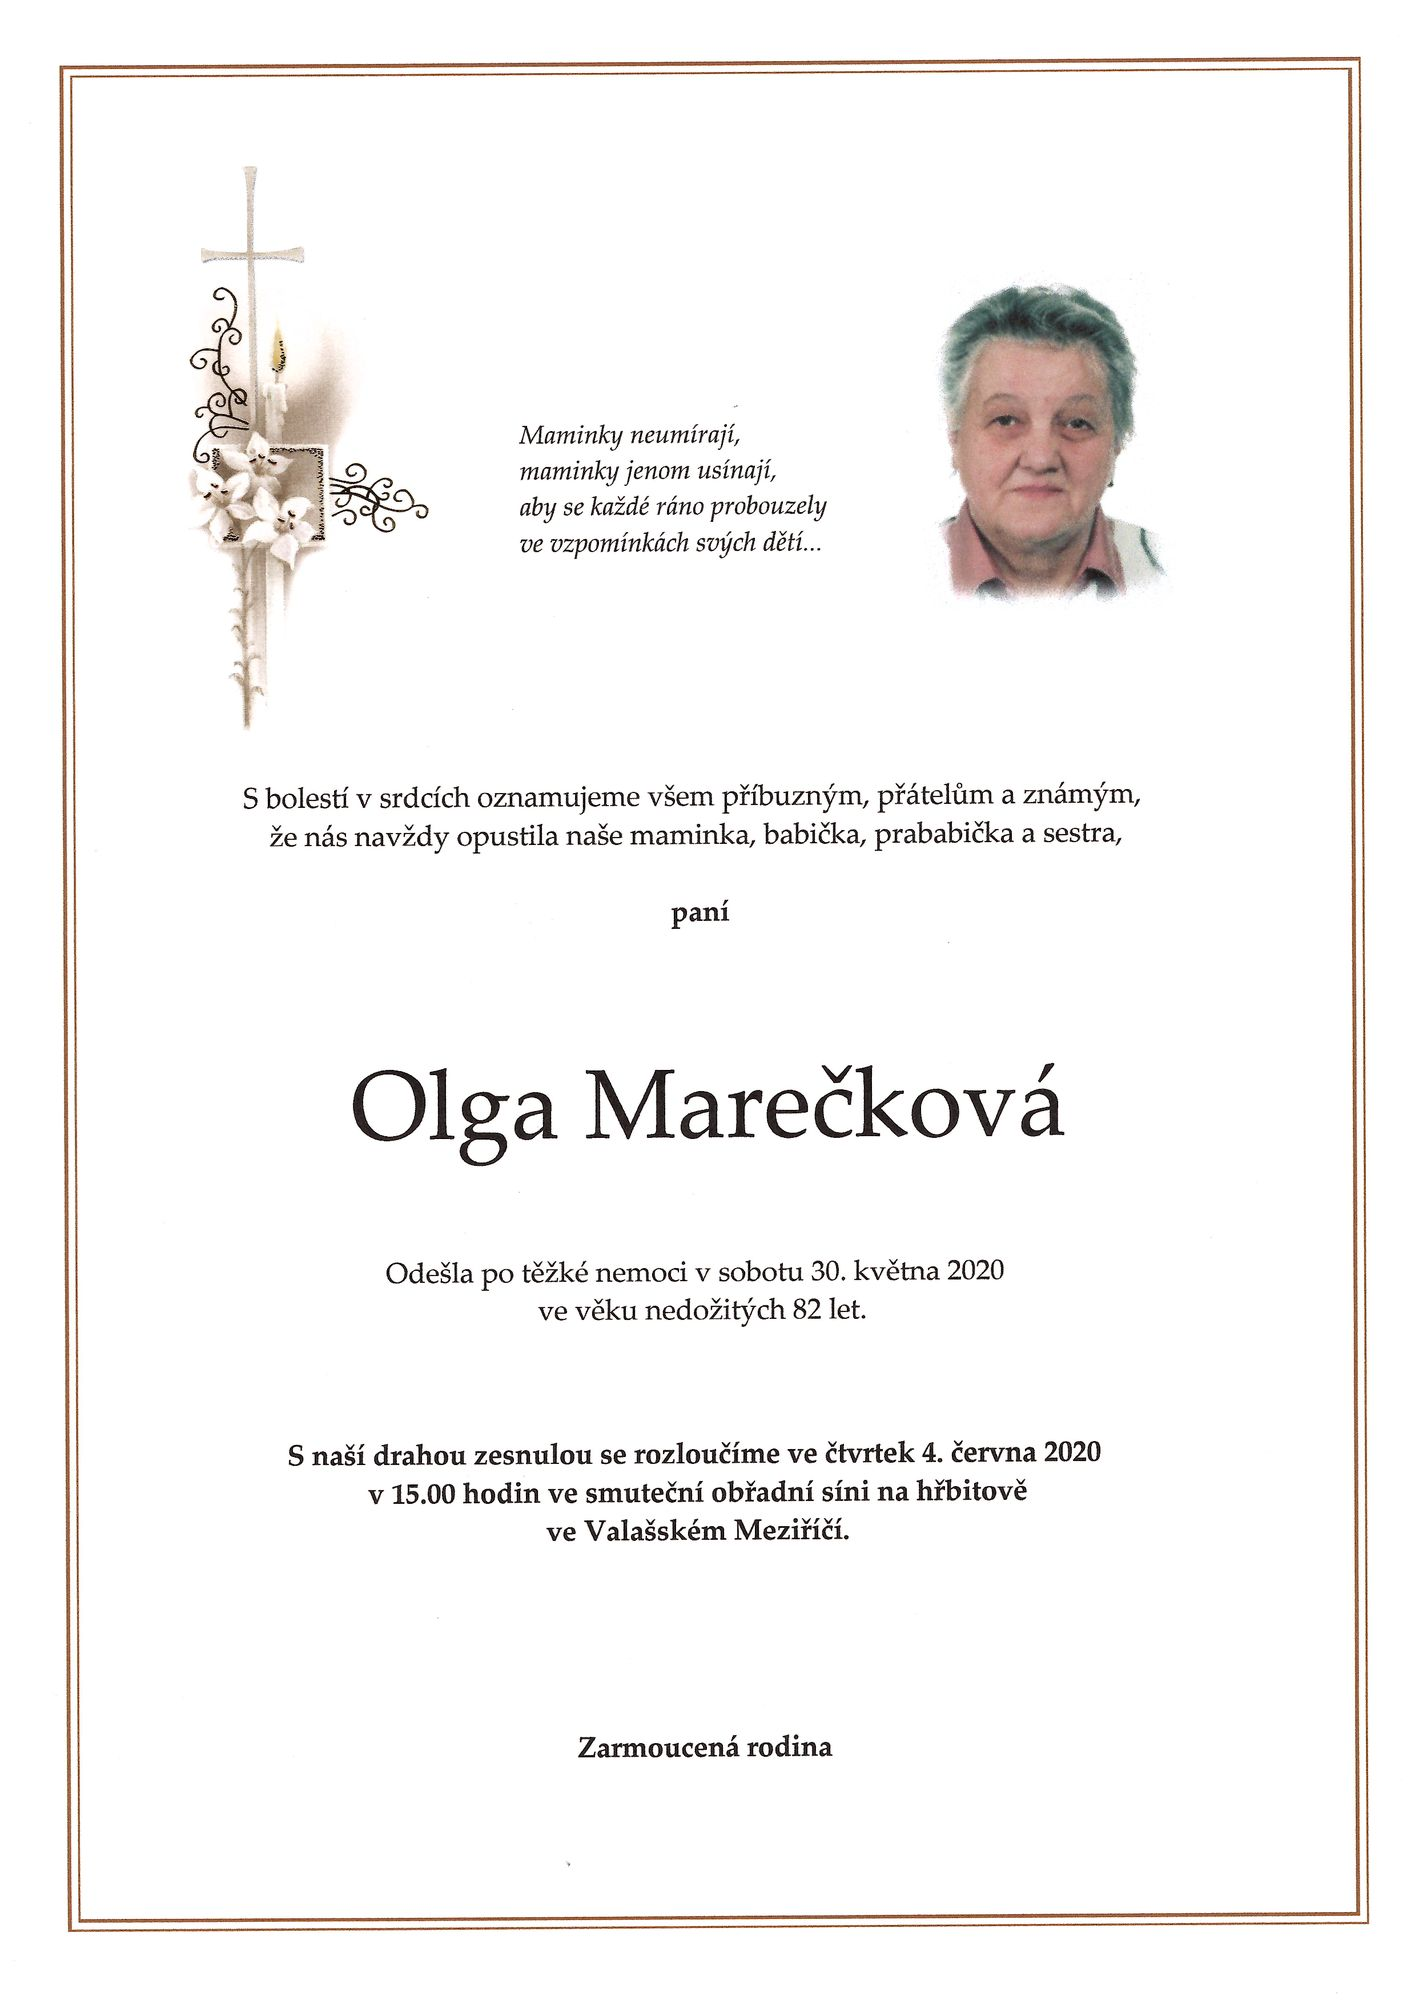 Olga Marečková